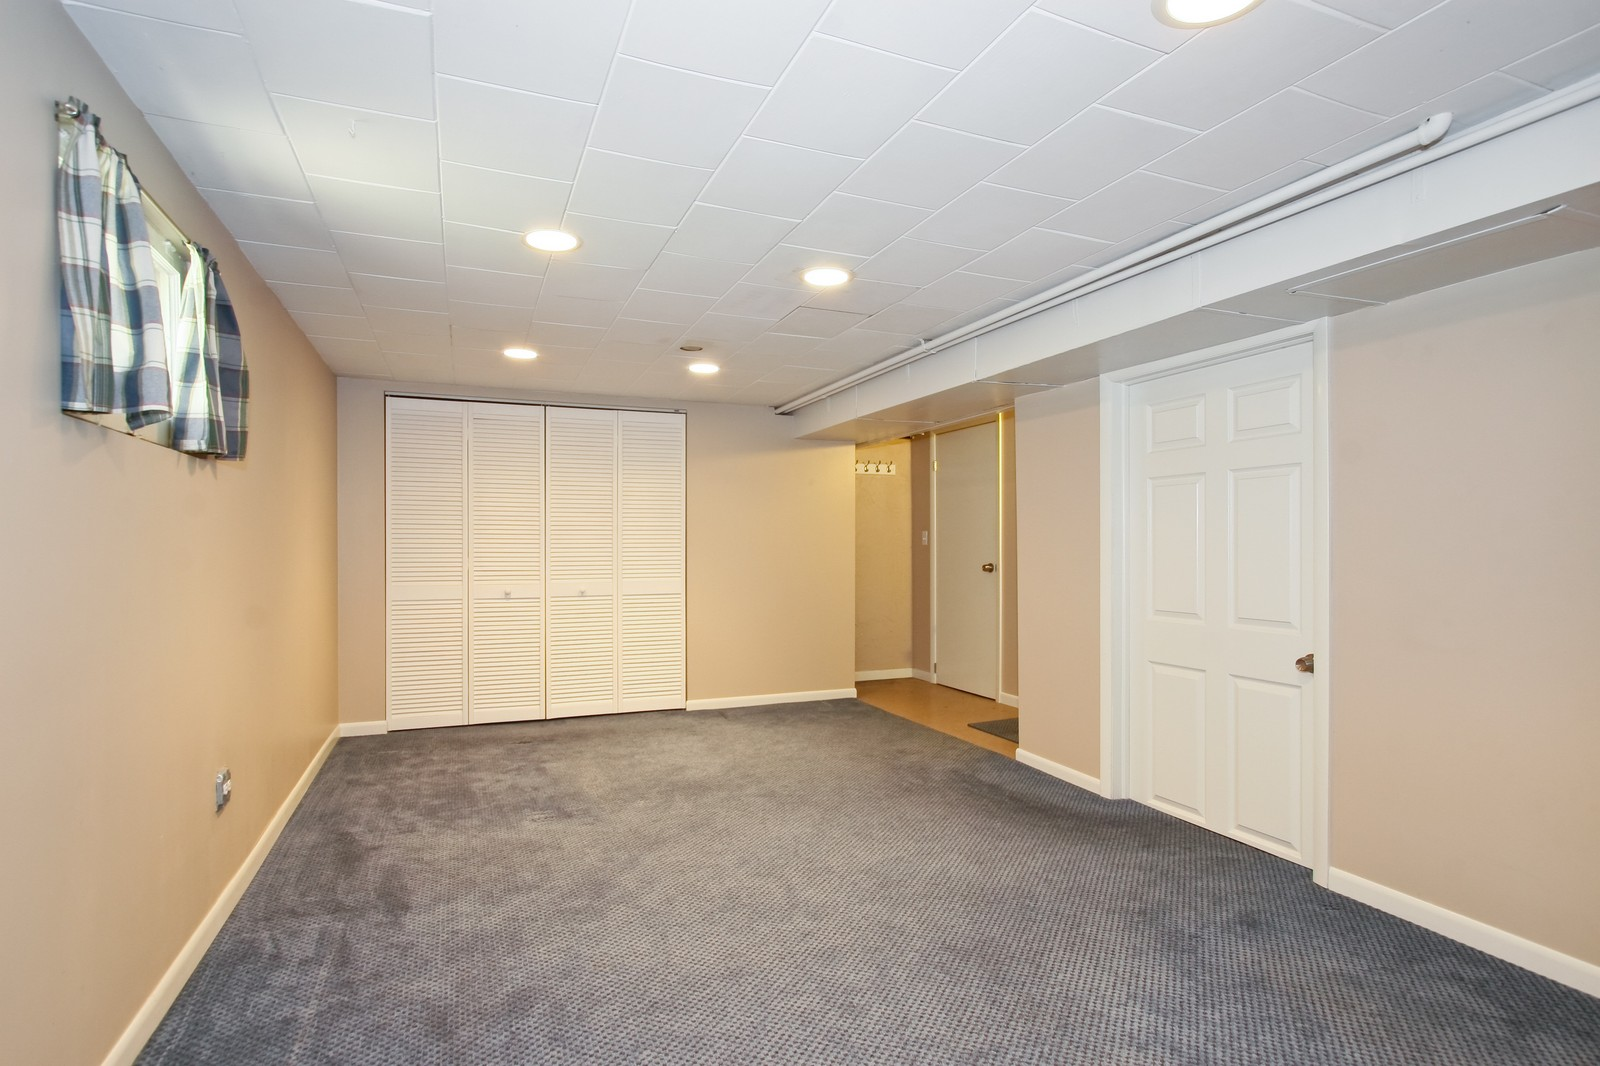 Real Estate Photography - 11246 S Avenue L, Chicago, IL, 60617 - Basement